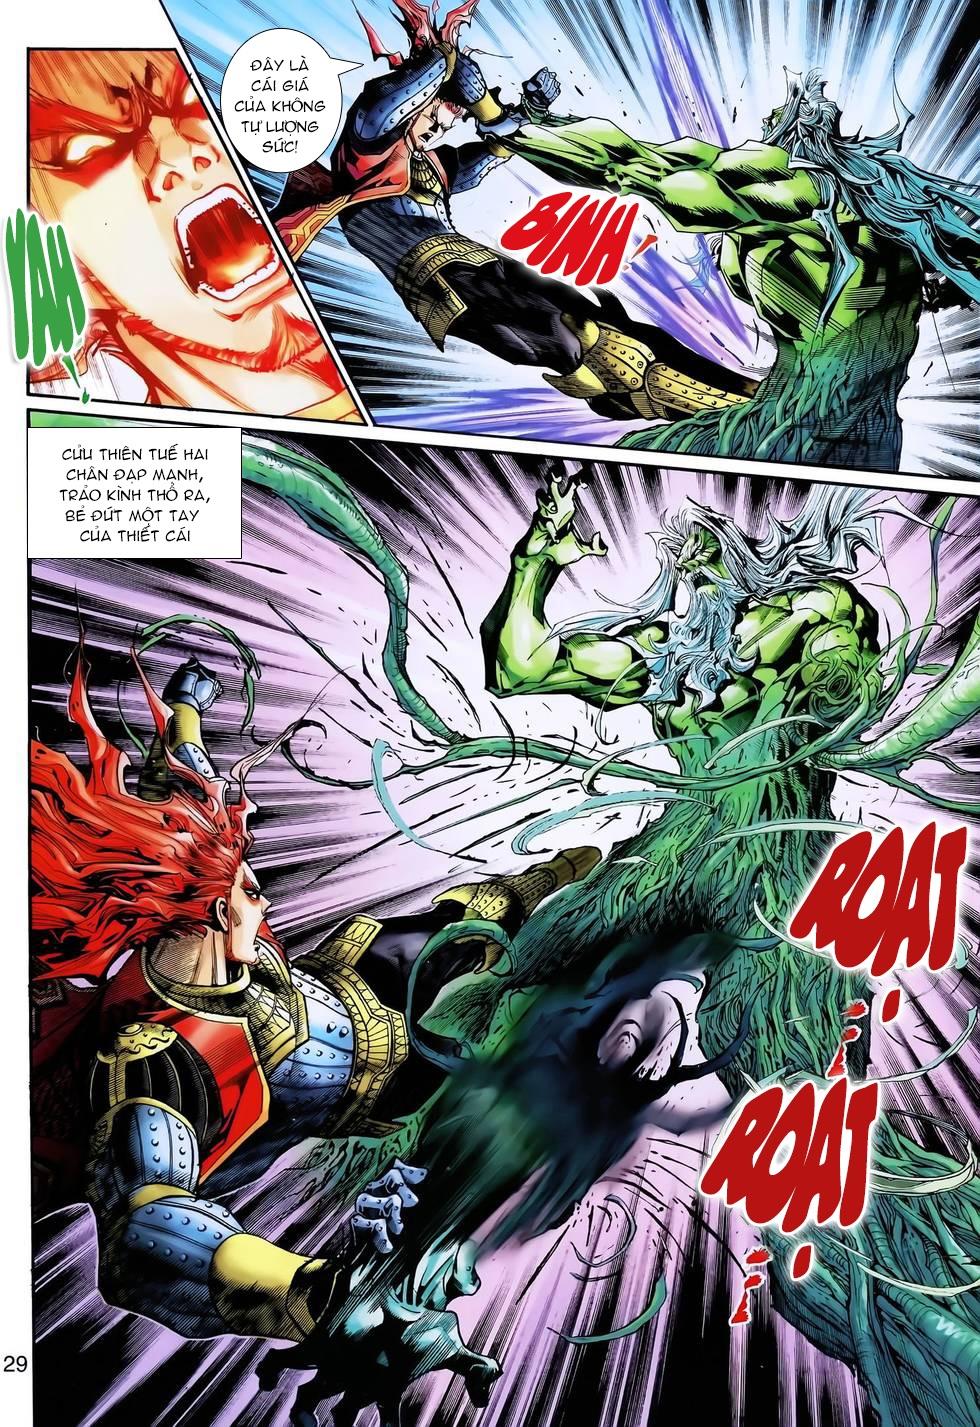 Thần binh huyền kỳ 3 - 3.5 Chapter 123 - Hamtruyen.vn